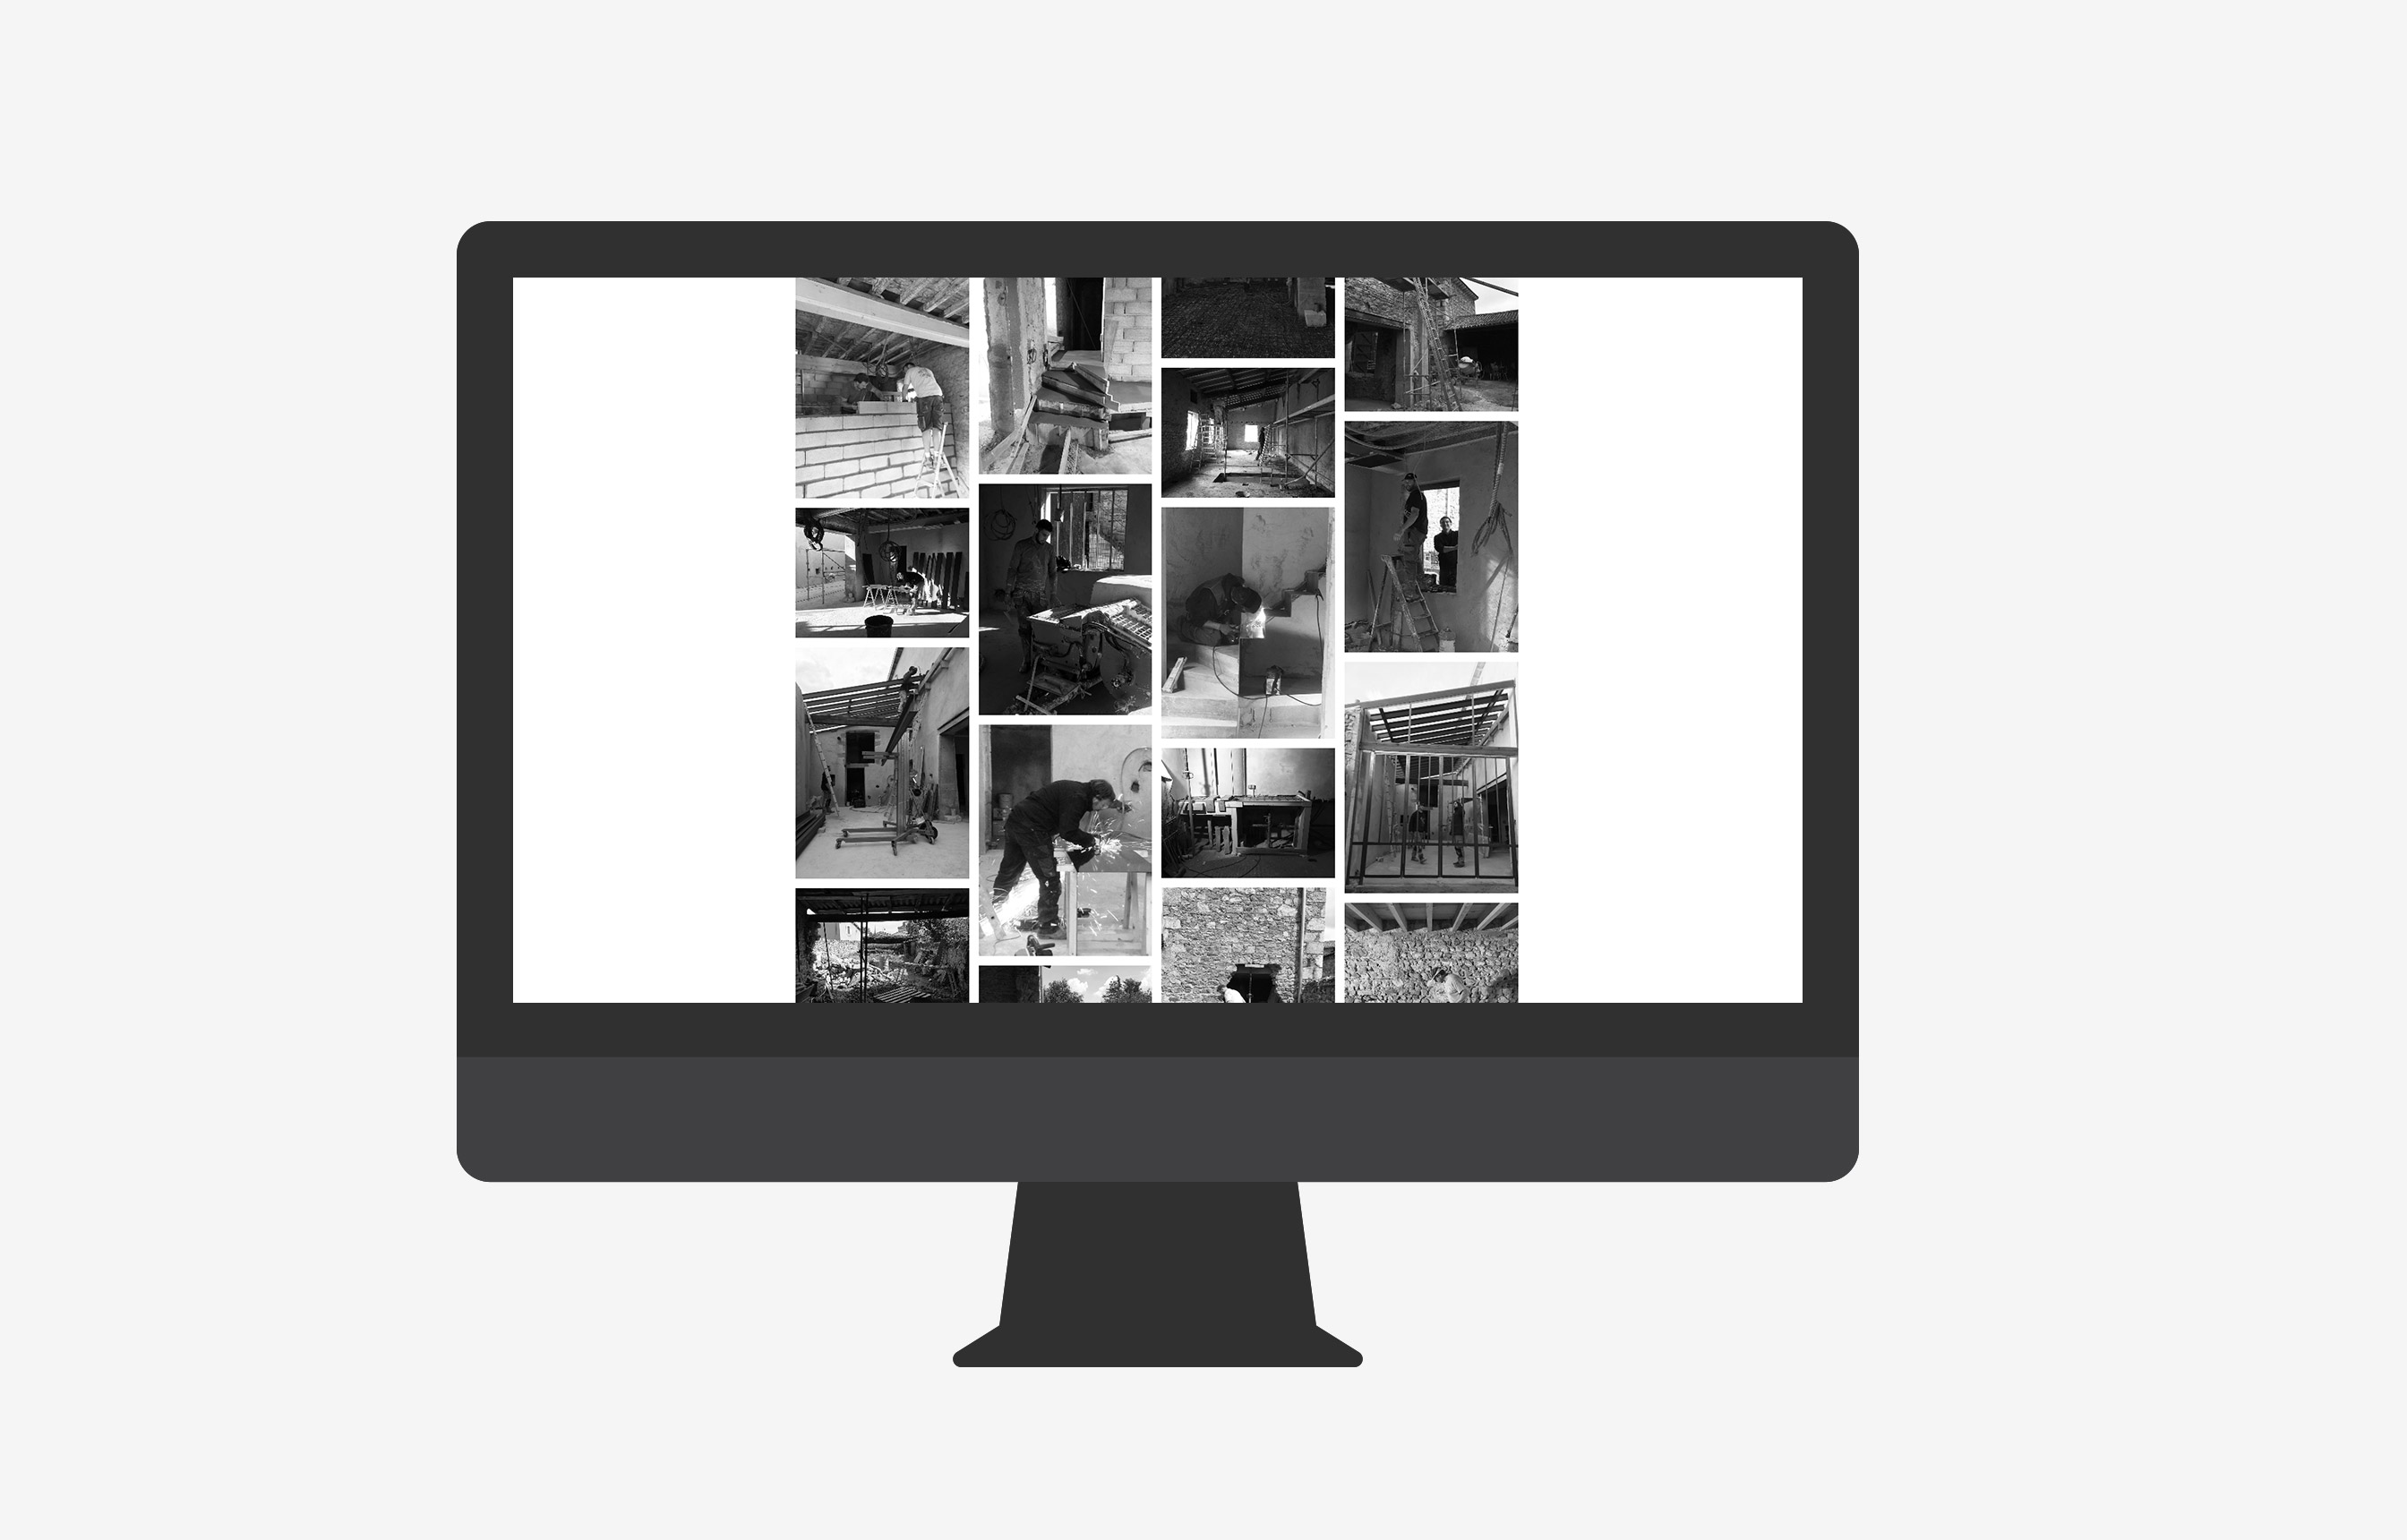 03-lafarelle-pikteo-webdesign-graphic-design-freelance-paris-bruxelles-londres